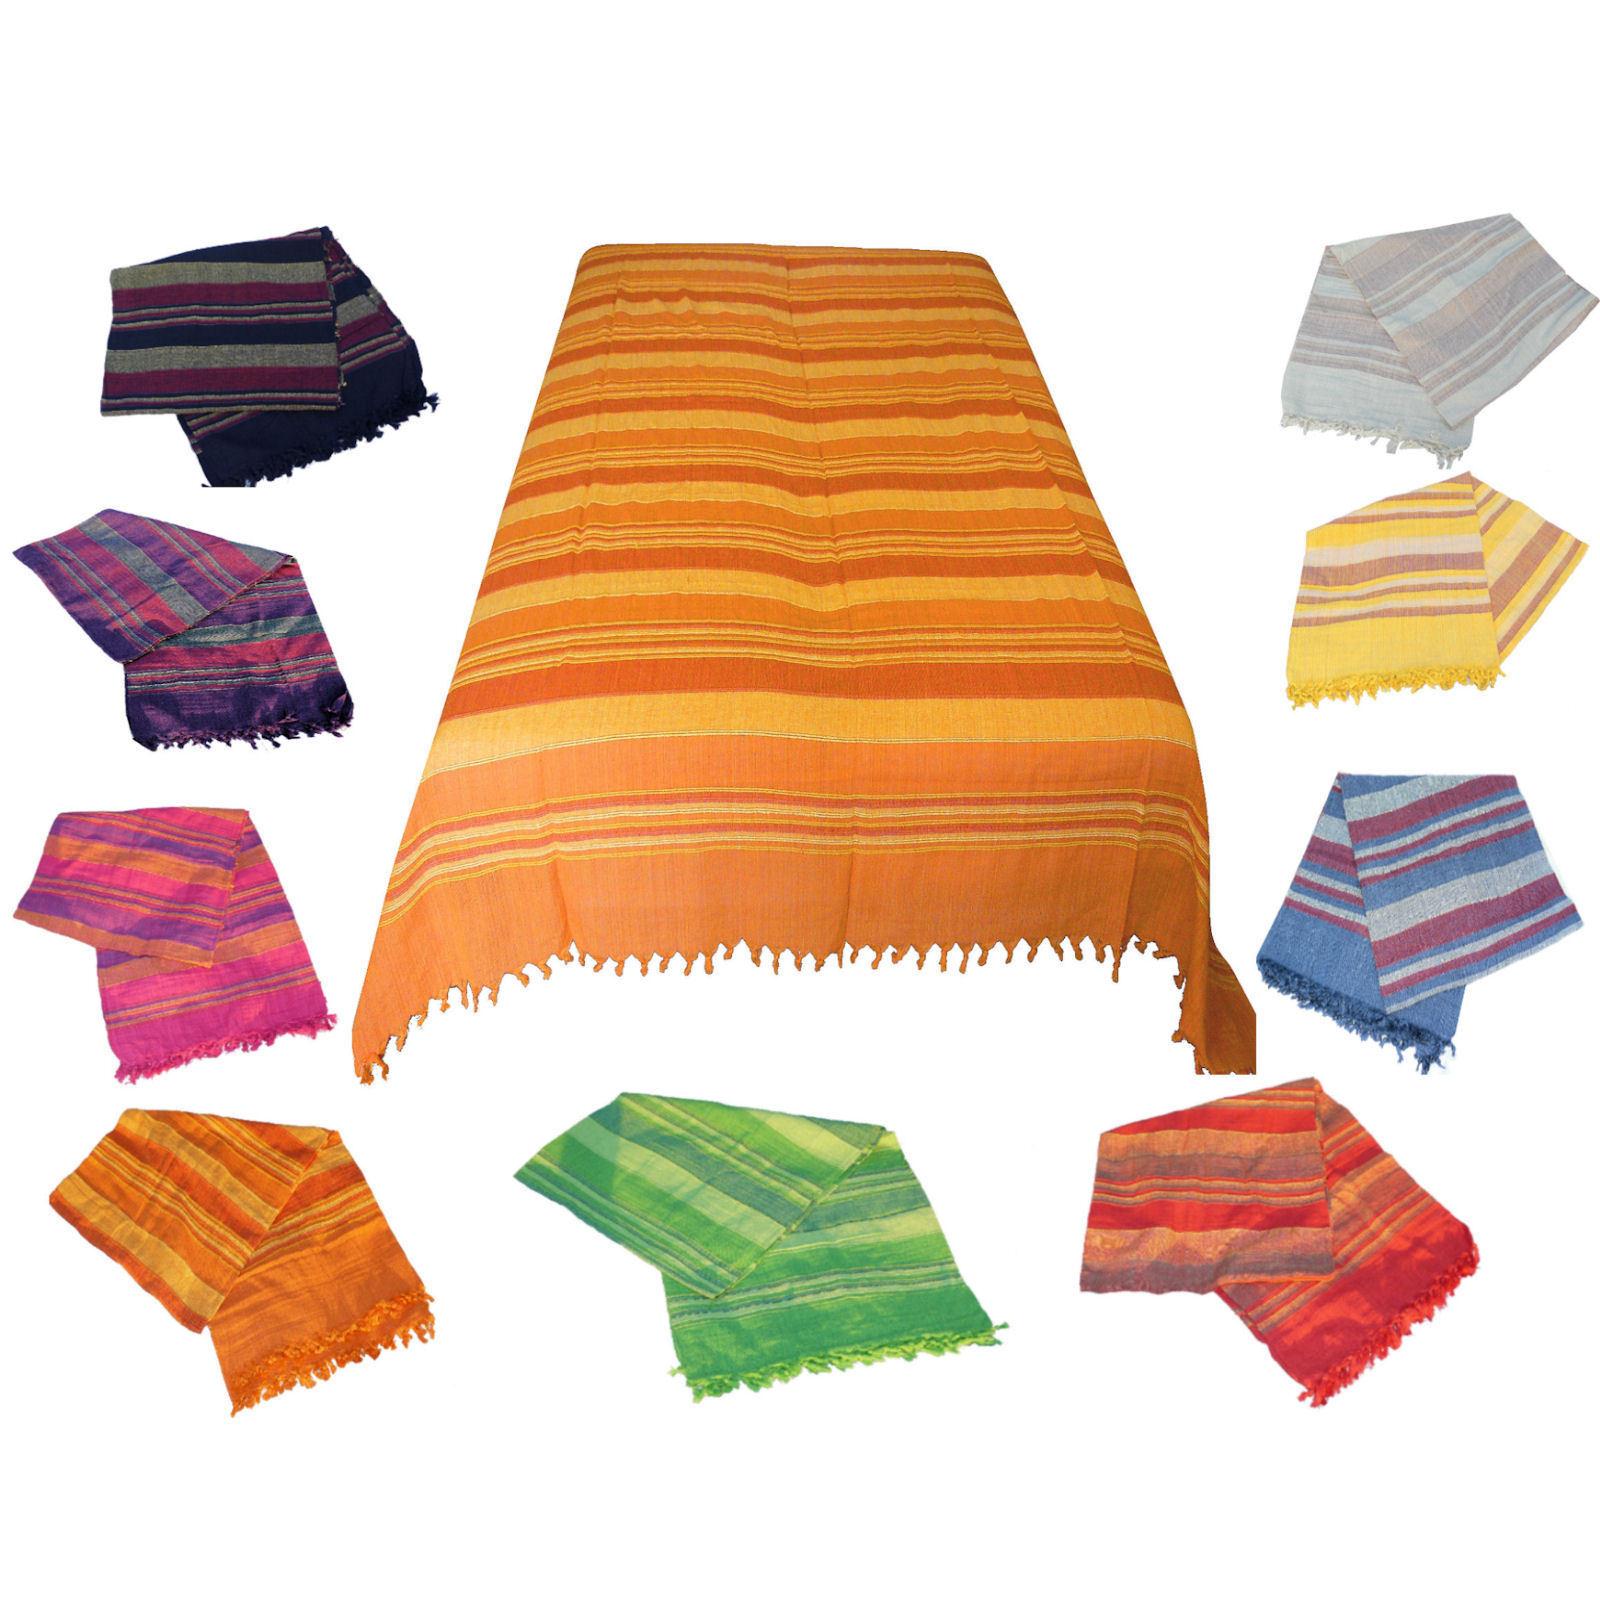 tagesdecke xxl sofa berwurf bett berwurf wohndecke nepal morocco baumwolle decke bett berw rfe. Black Bedroom Furniture Sets. Home Design Ideas